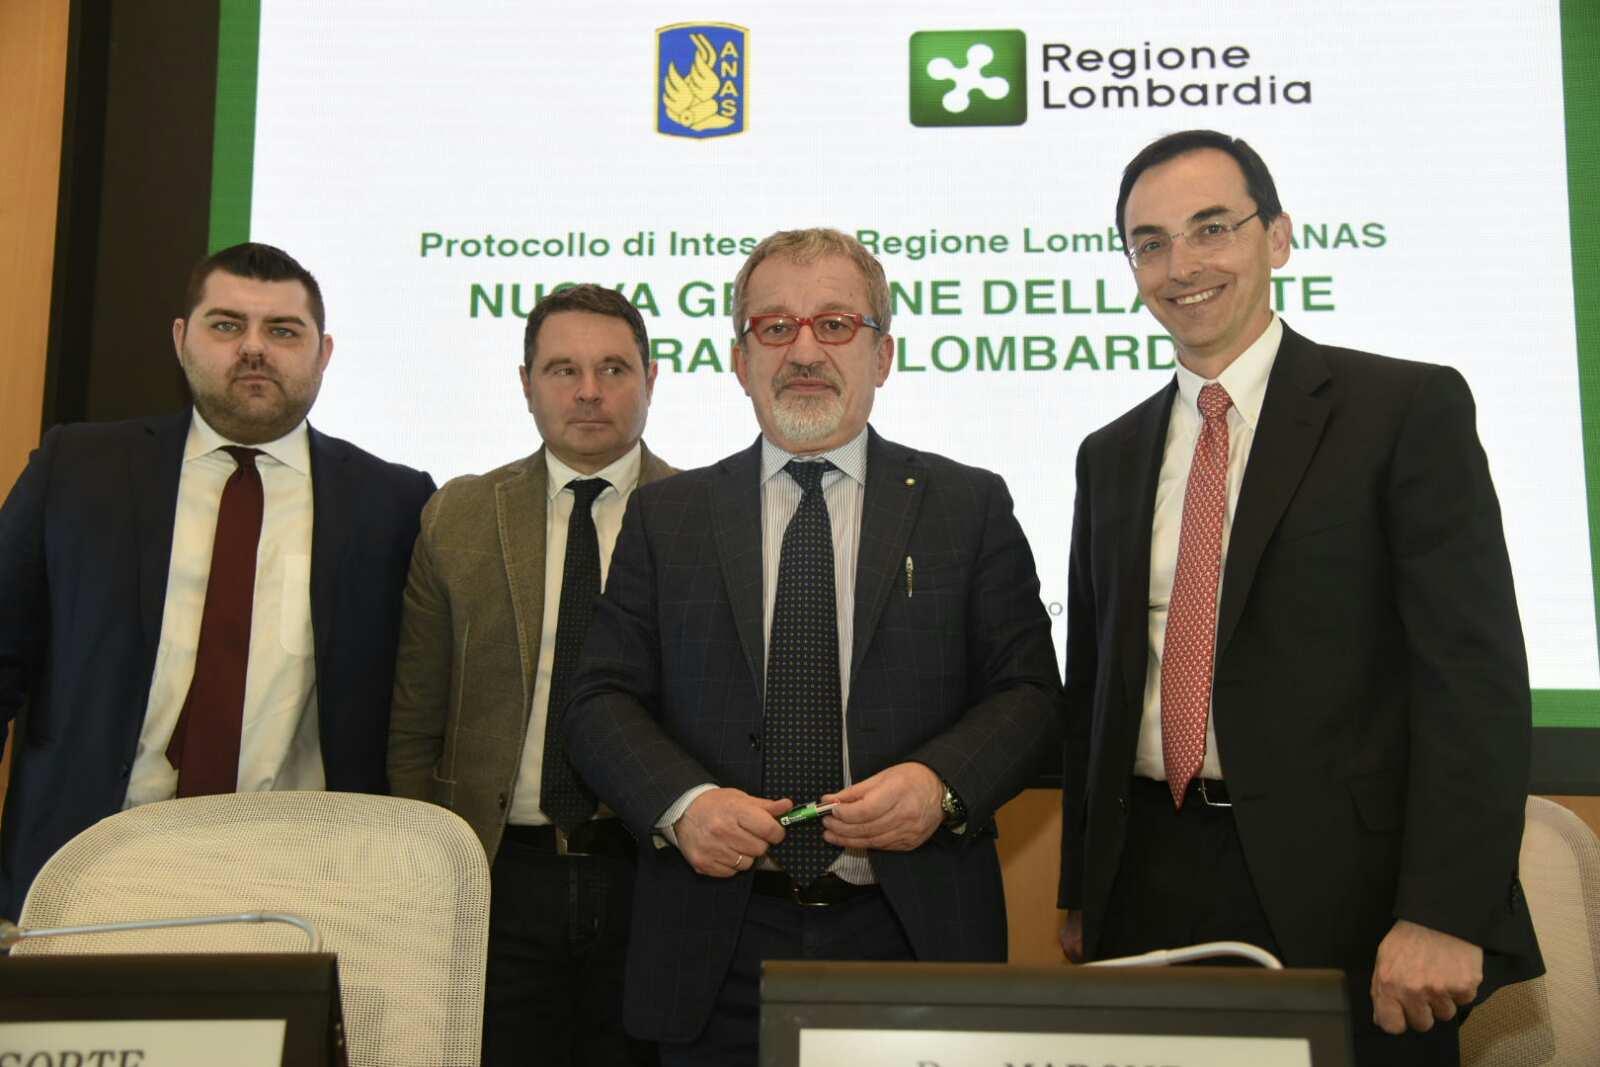 Incontro Anas - Regione Lombardia